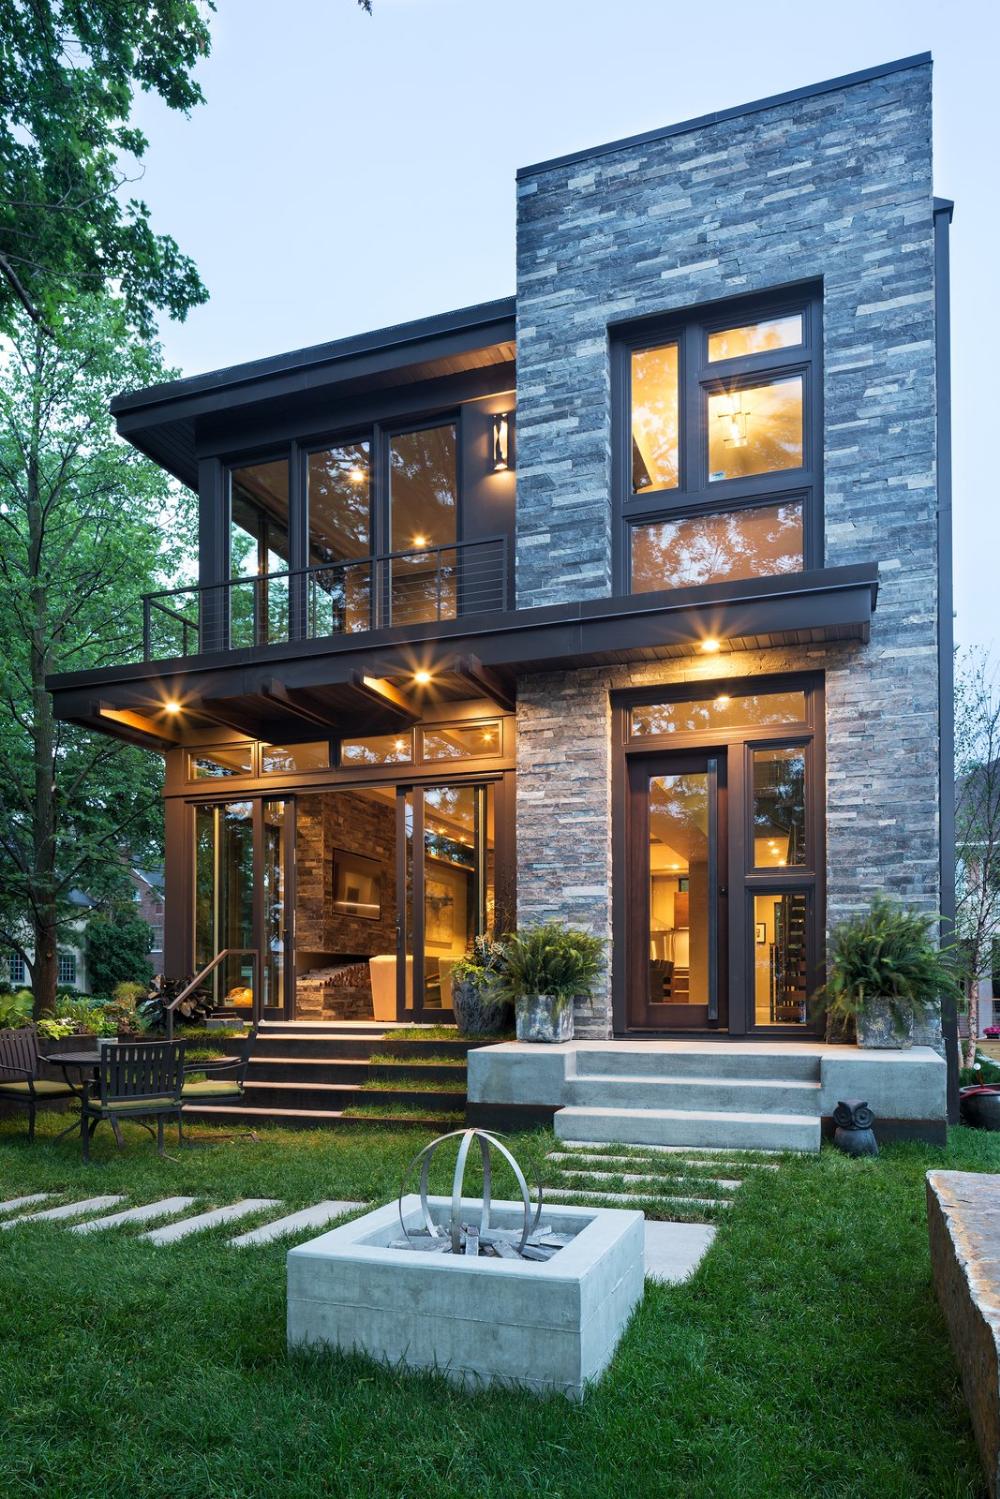 Lake Calhoun Organic Modern Modern Home in Minneapolis, Minnesota on Dwell